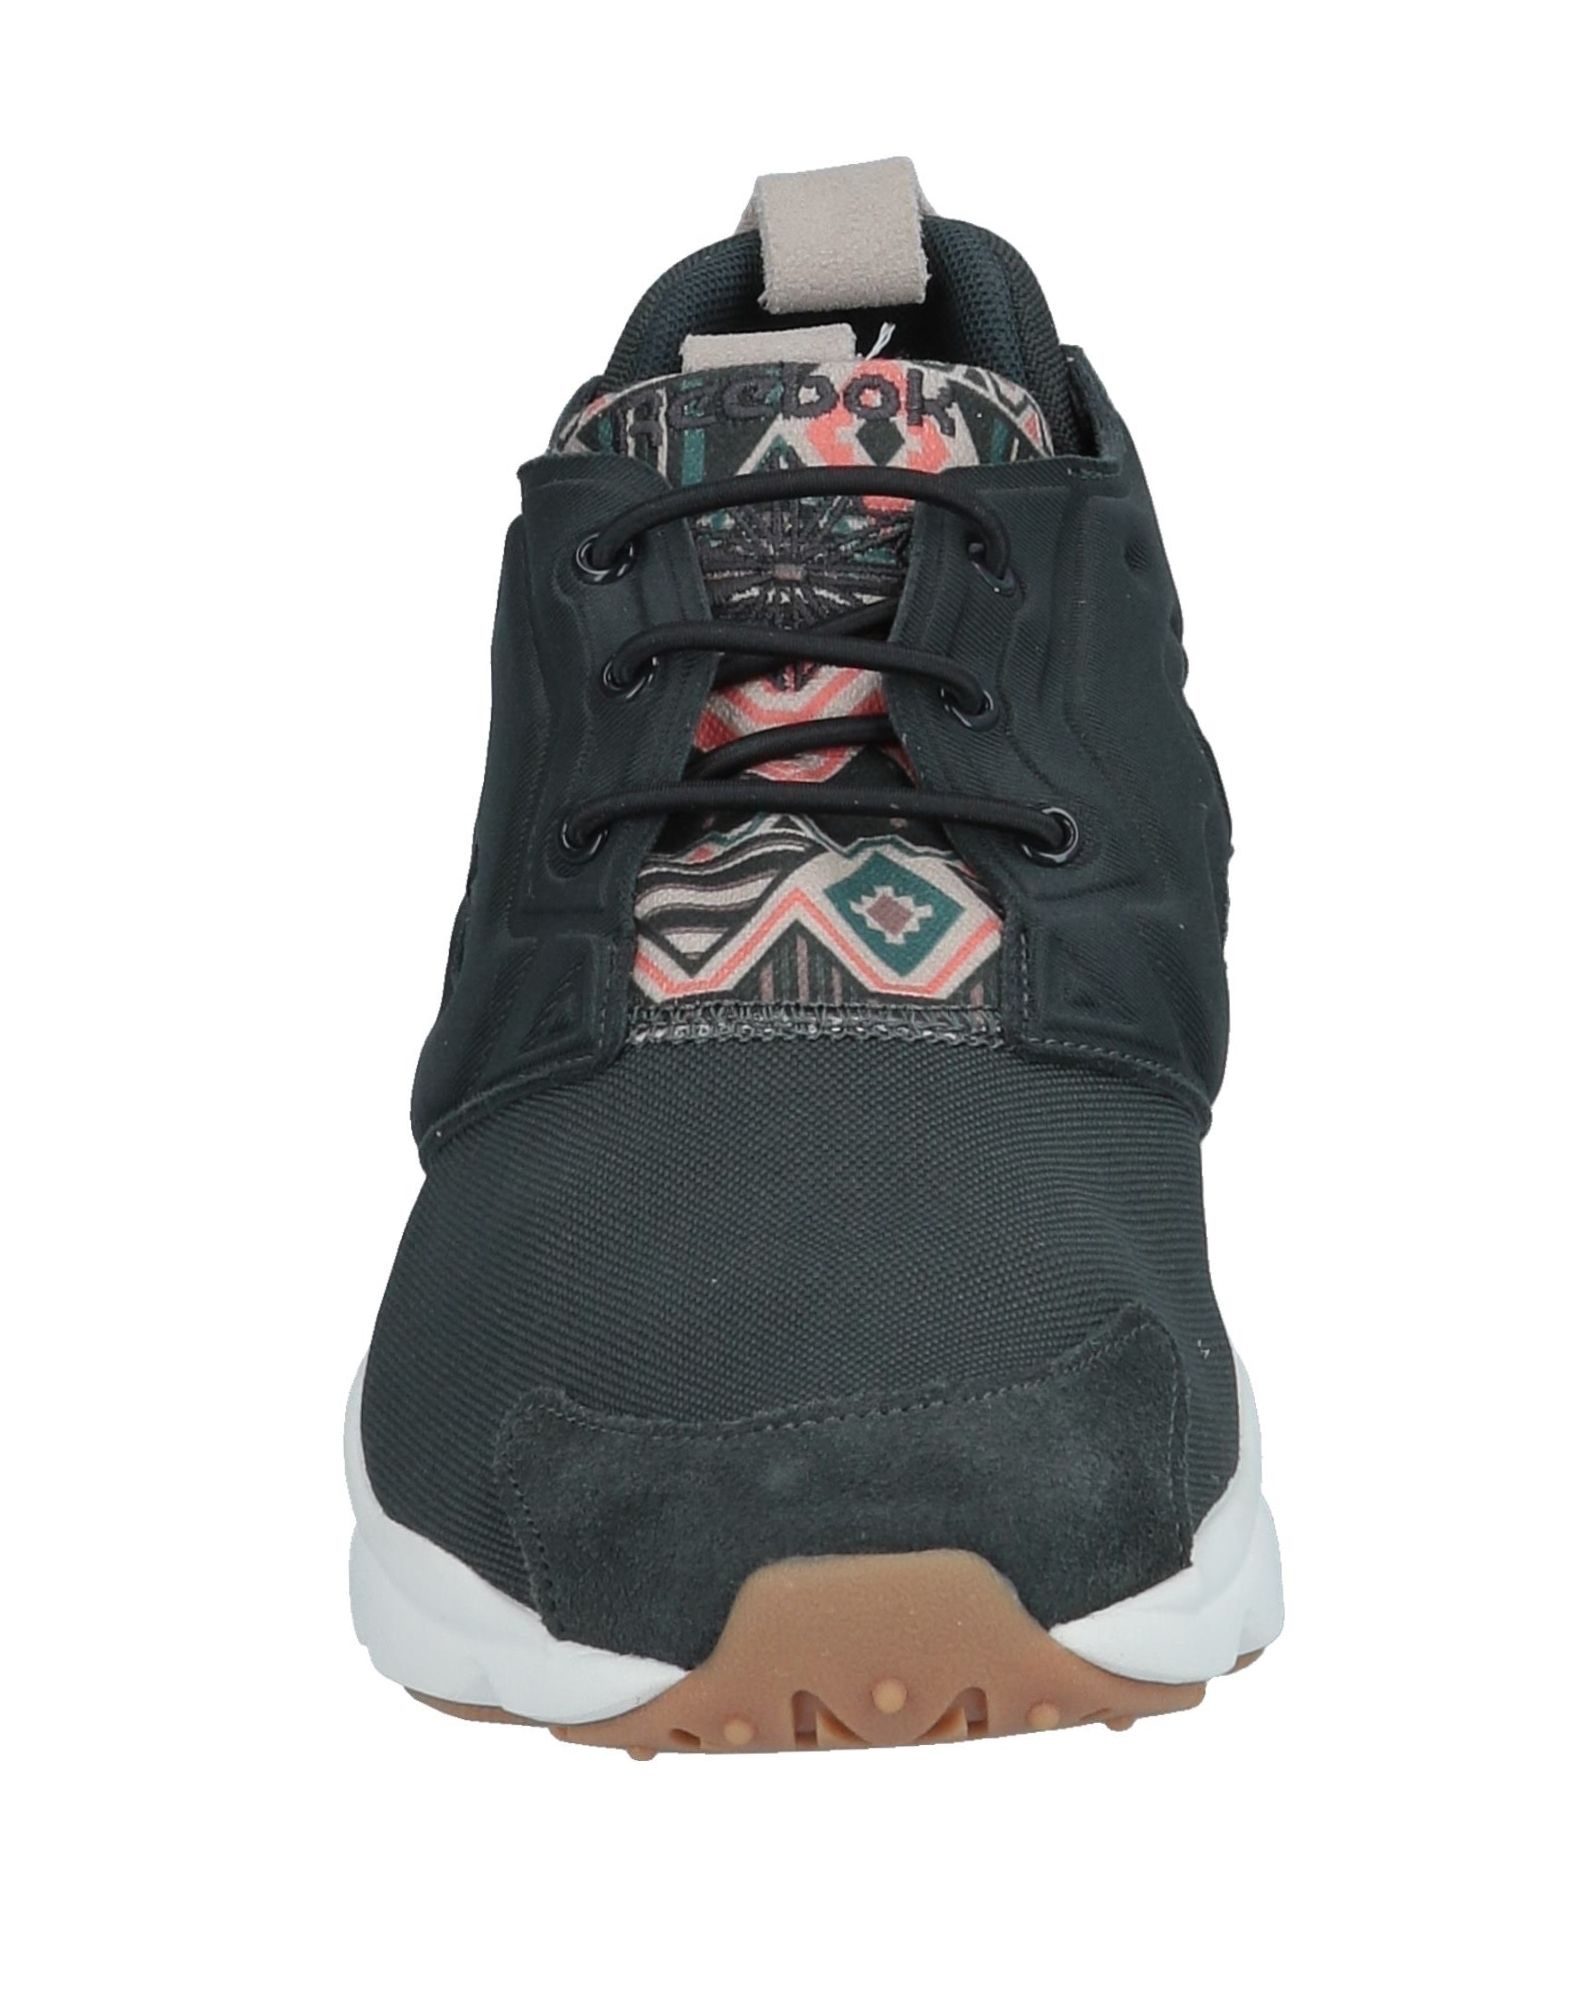 Reebok Sneakers - Men  Reebok Sneakers online on  Men United Kingdom - 11555983CB 9bad82